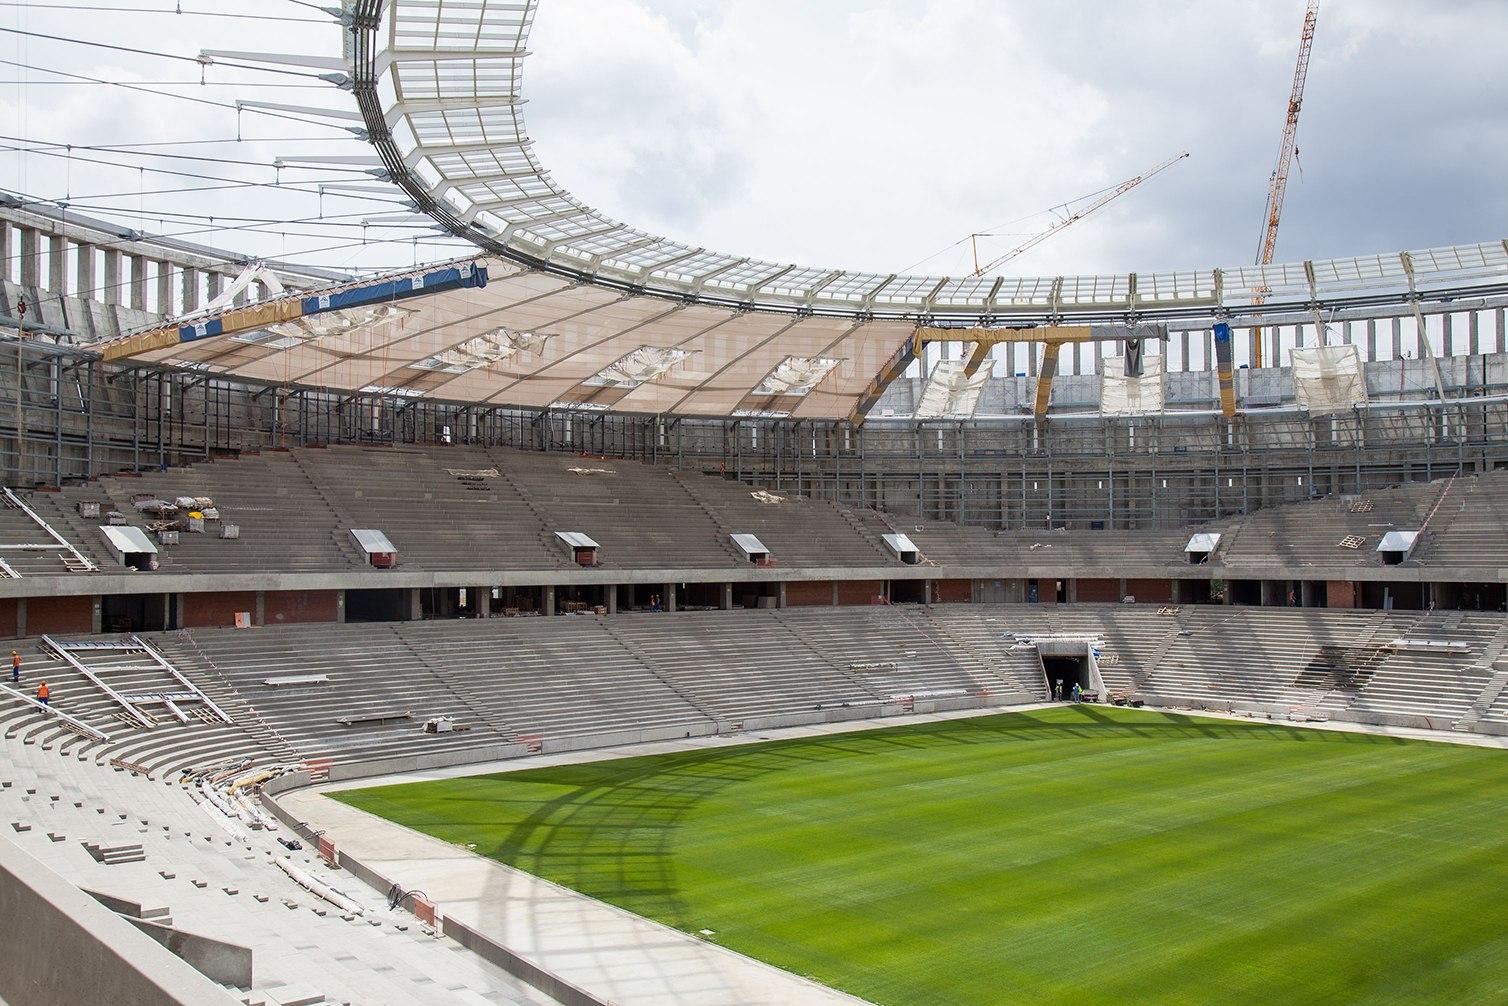 stadion-105.jpg